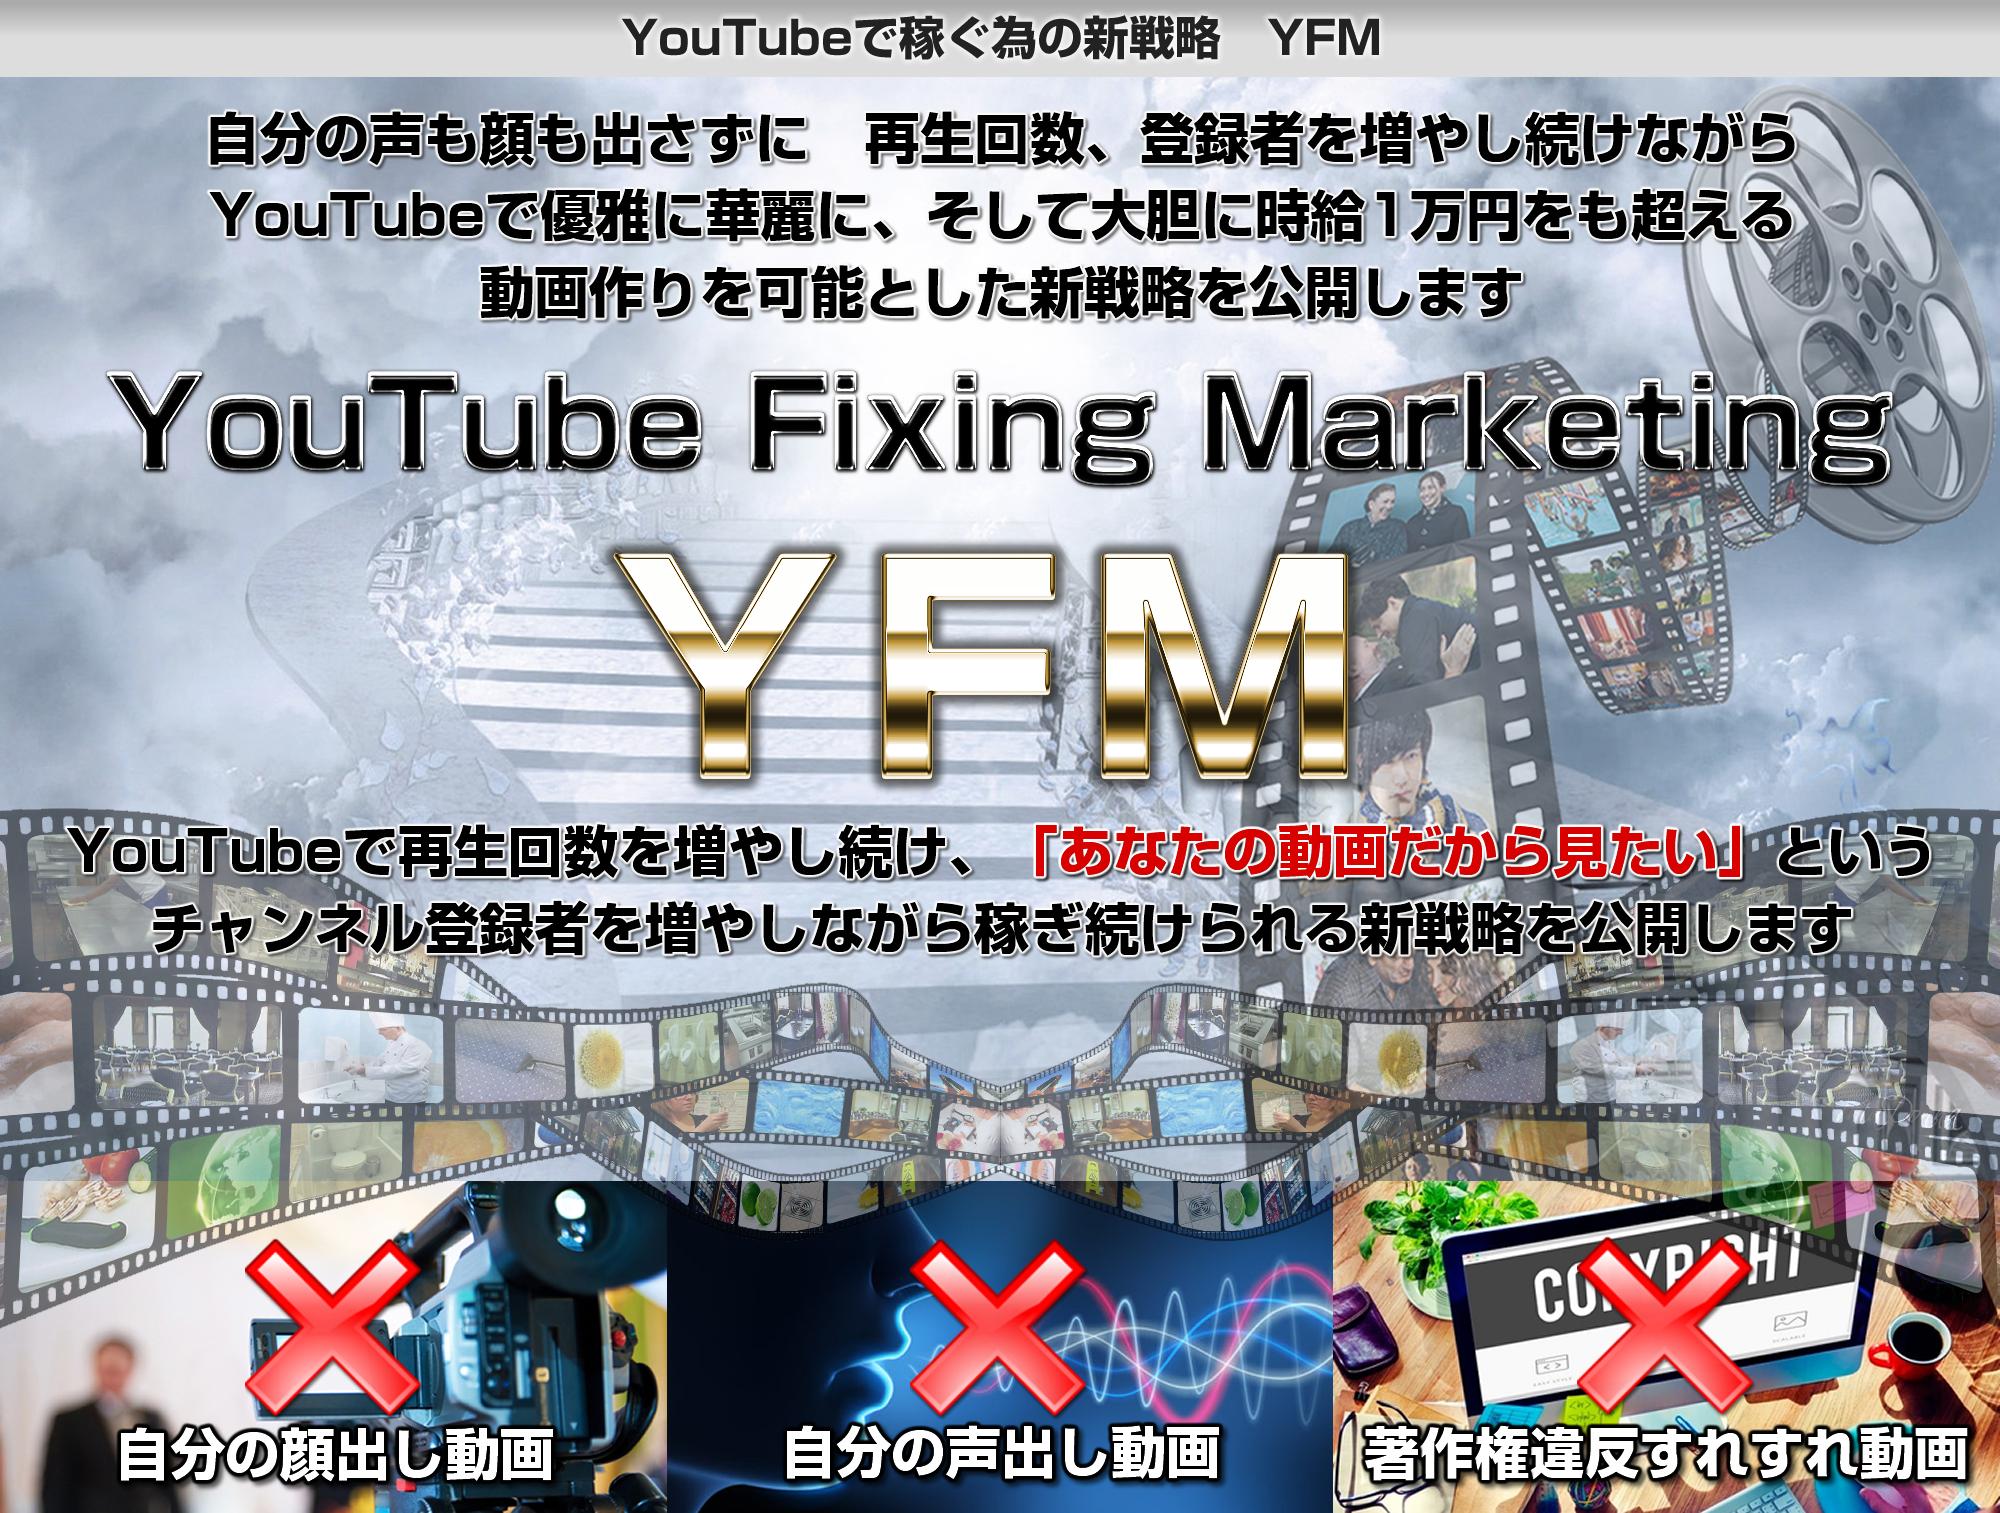 YouTubeで稼ぐYFM